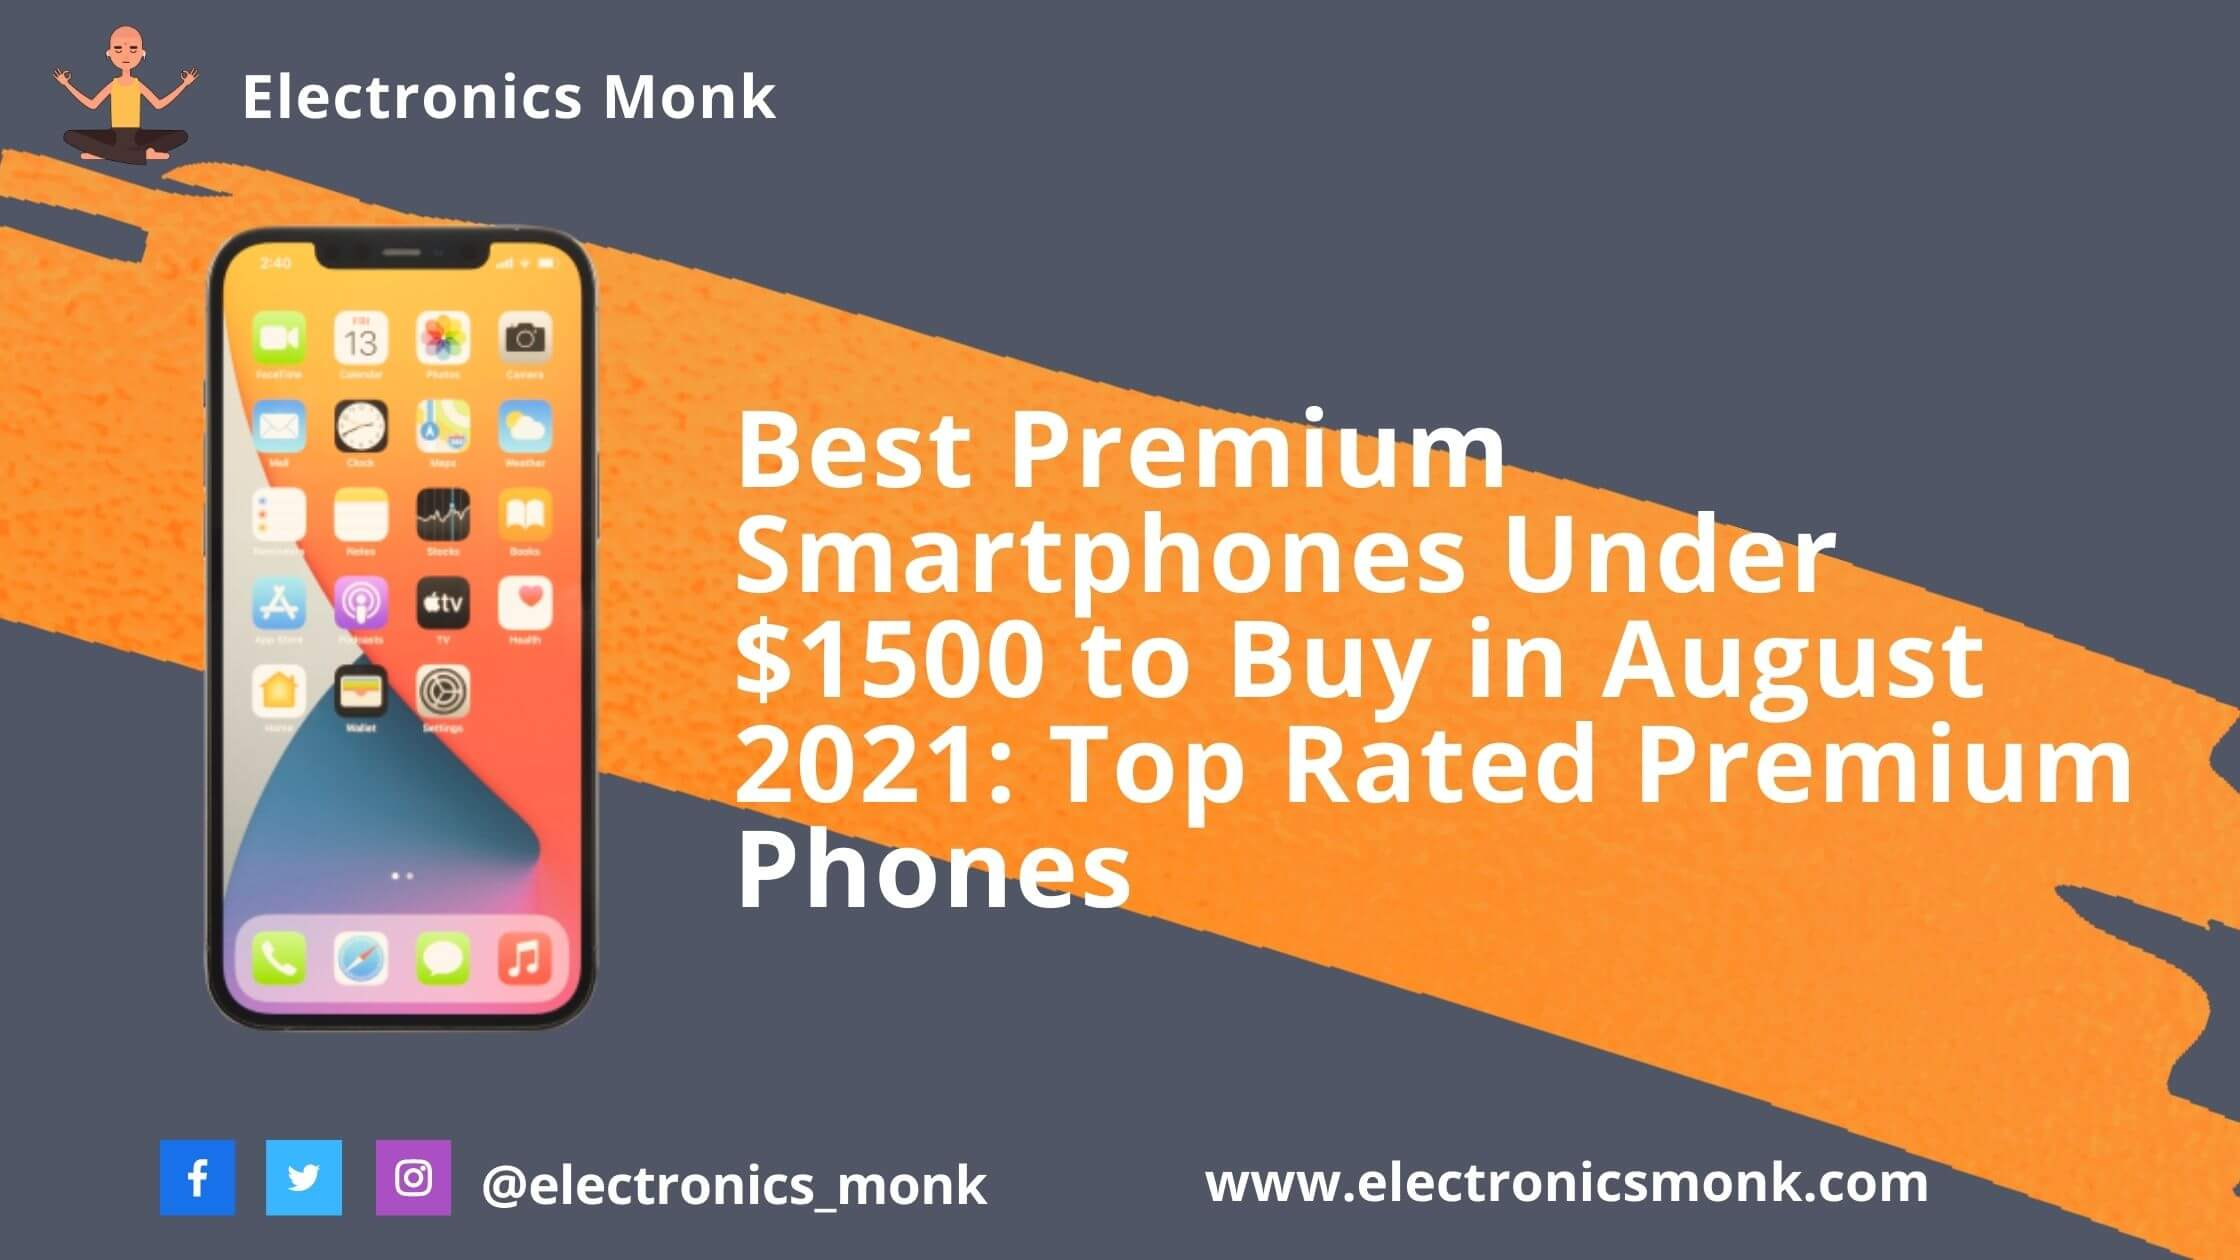 Best Premium Smartphones Under $1500 to Buy in August 2021: Top Rated Premium Phones